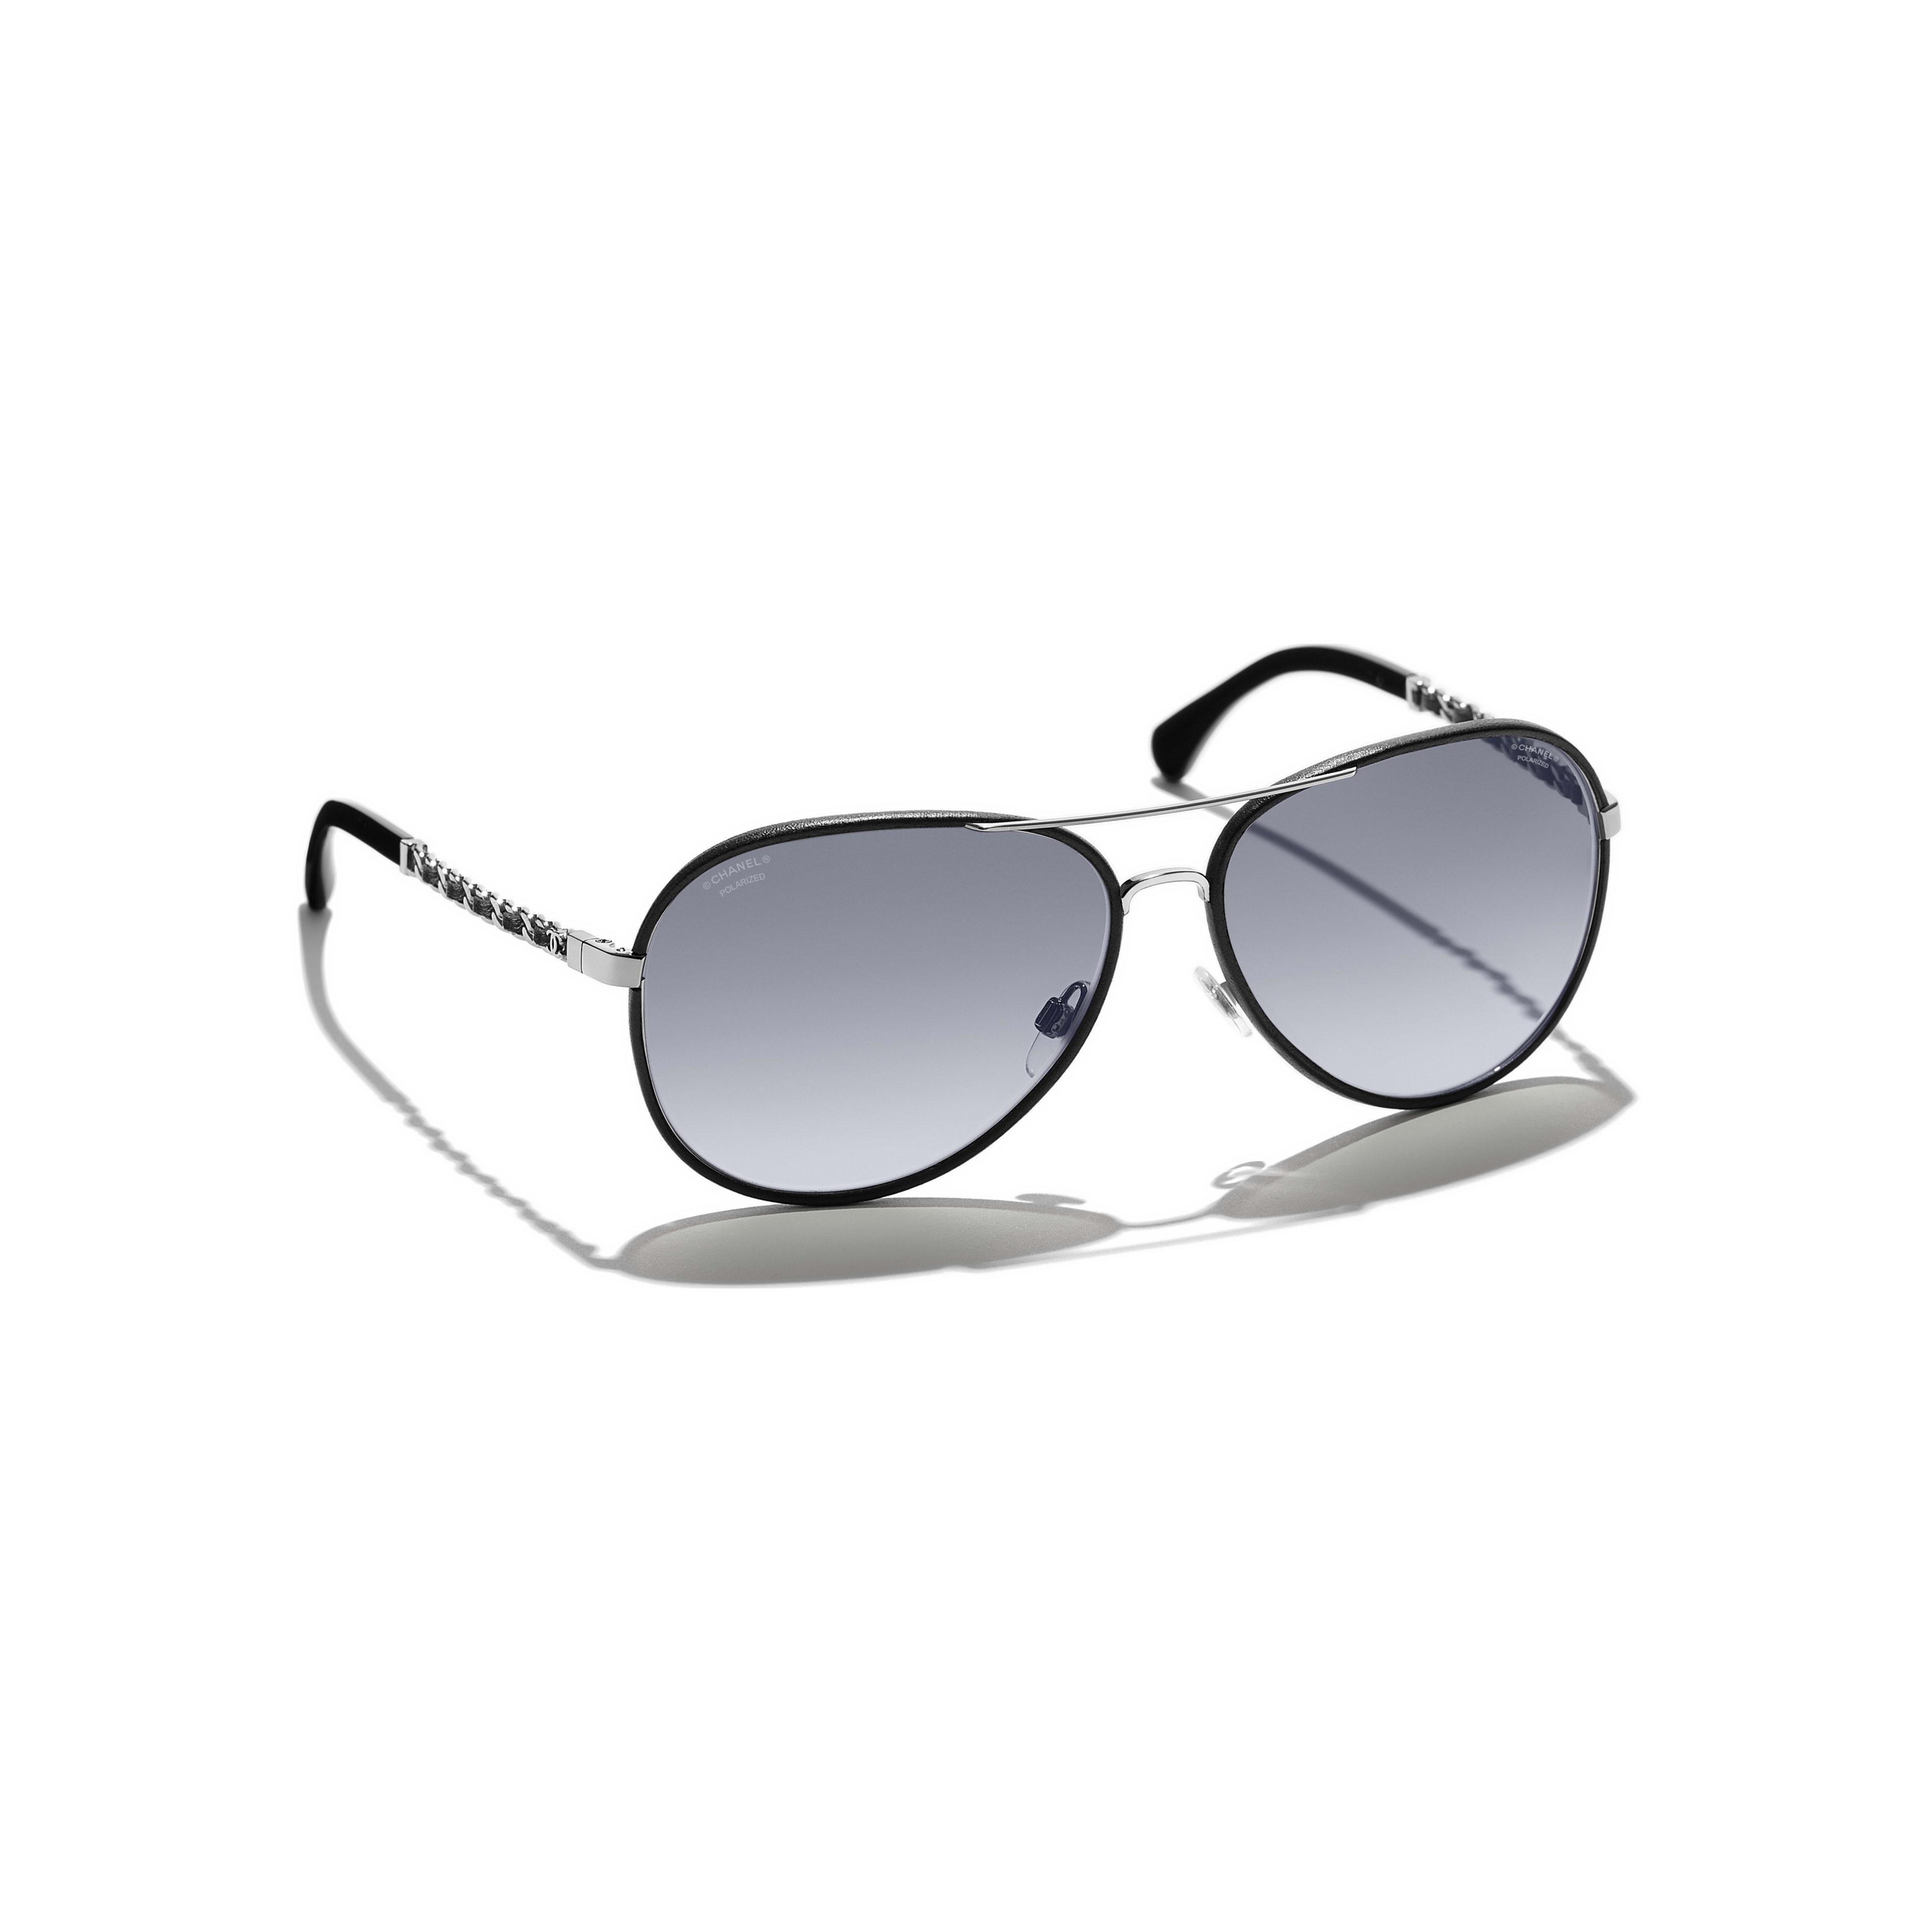 Pilot Sunglasses - Black - Metal & Calfskin - Polarized Lenses - Extra view - see standard sized version